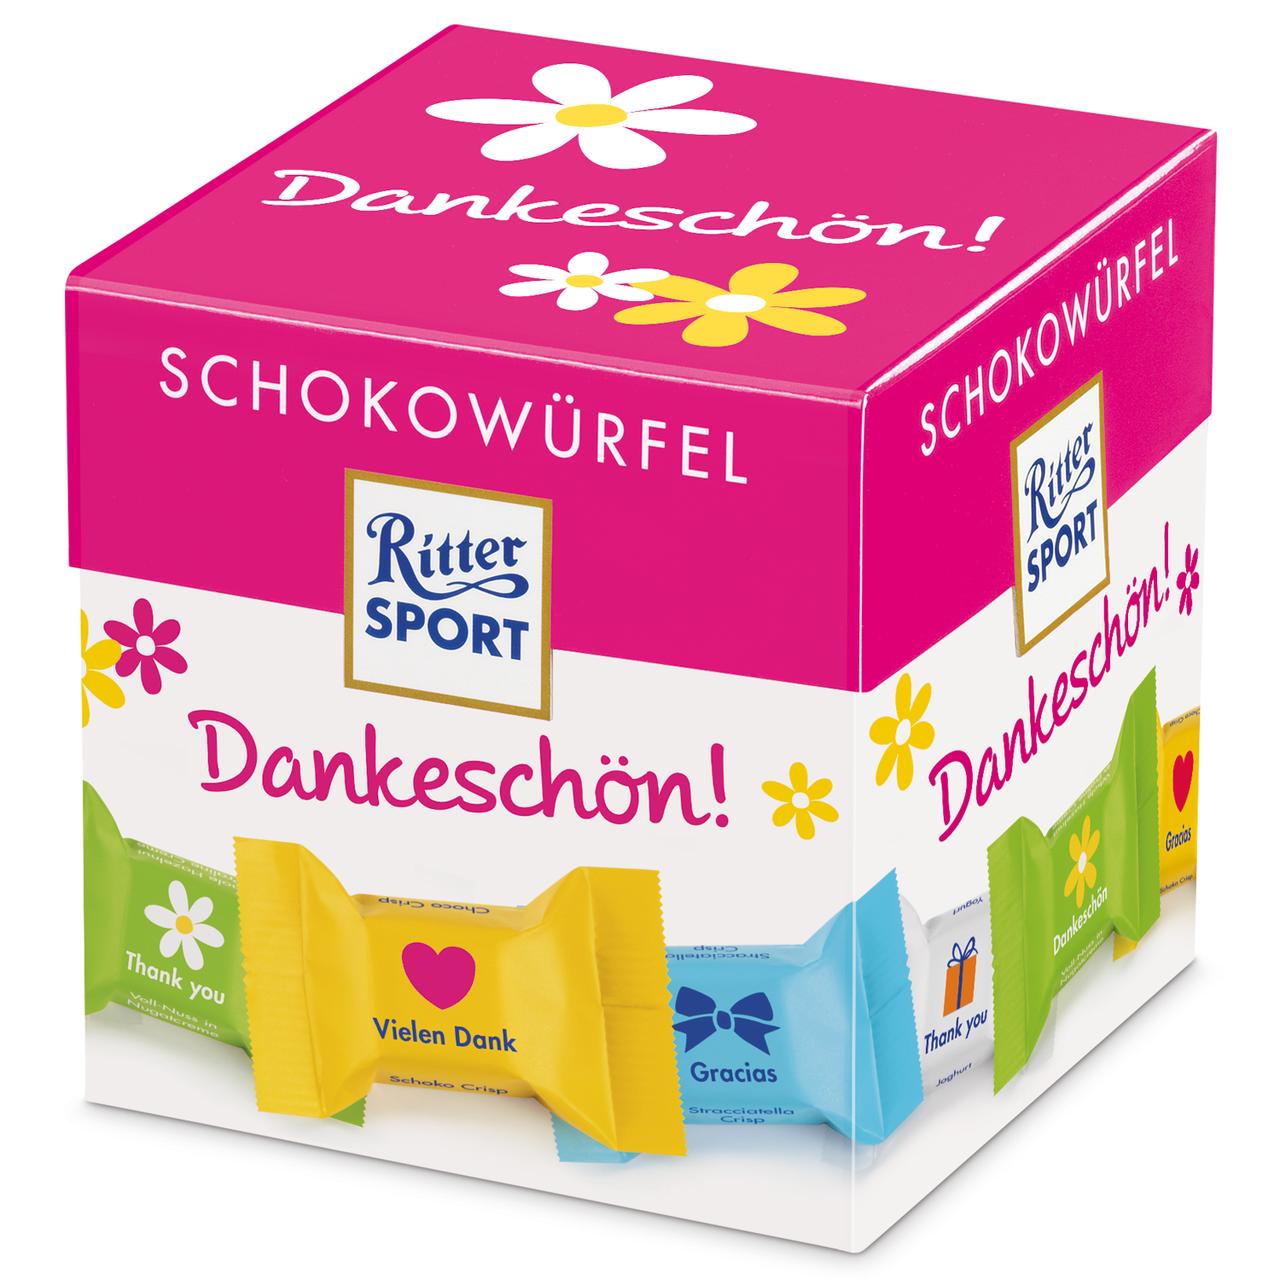 Набор шоколадных конфет Ritter Sport Schokowurfel Dankeschon, 176 г.